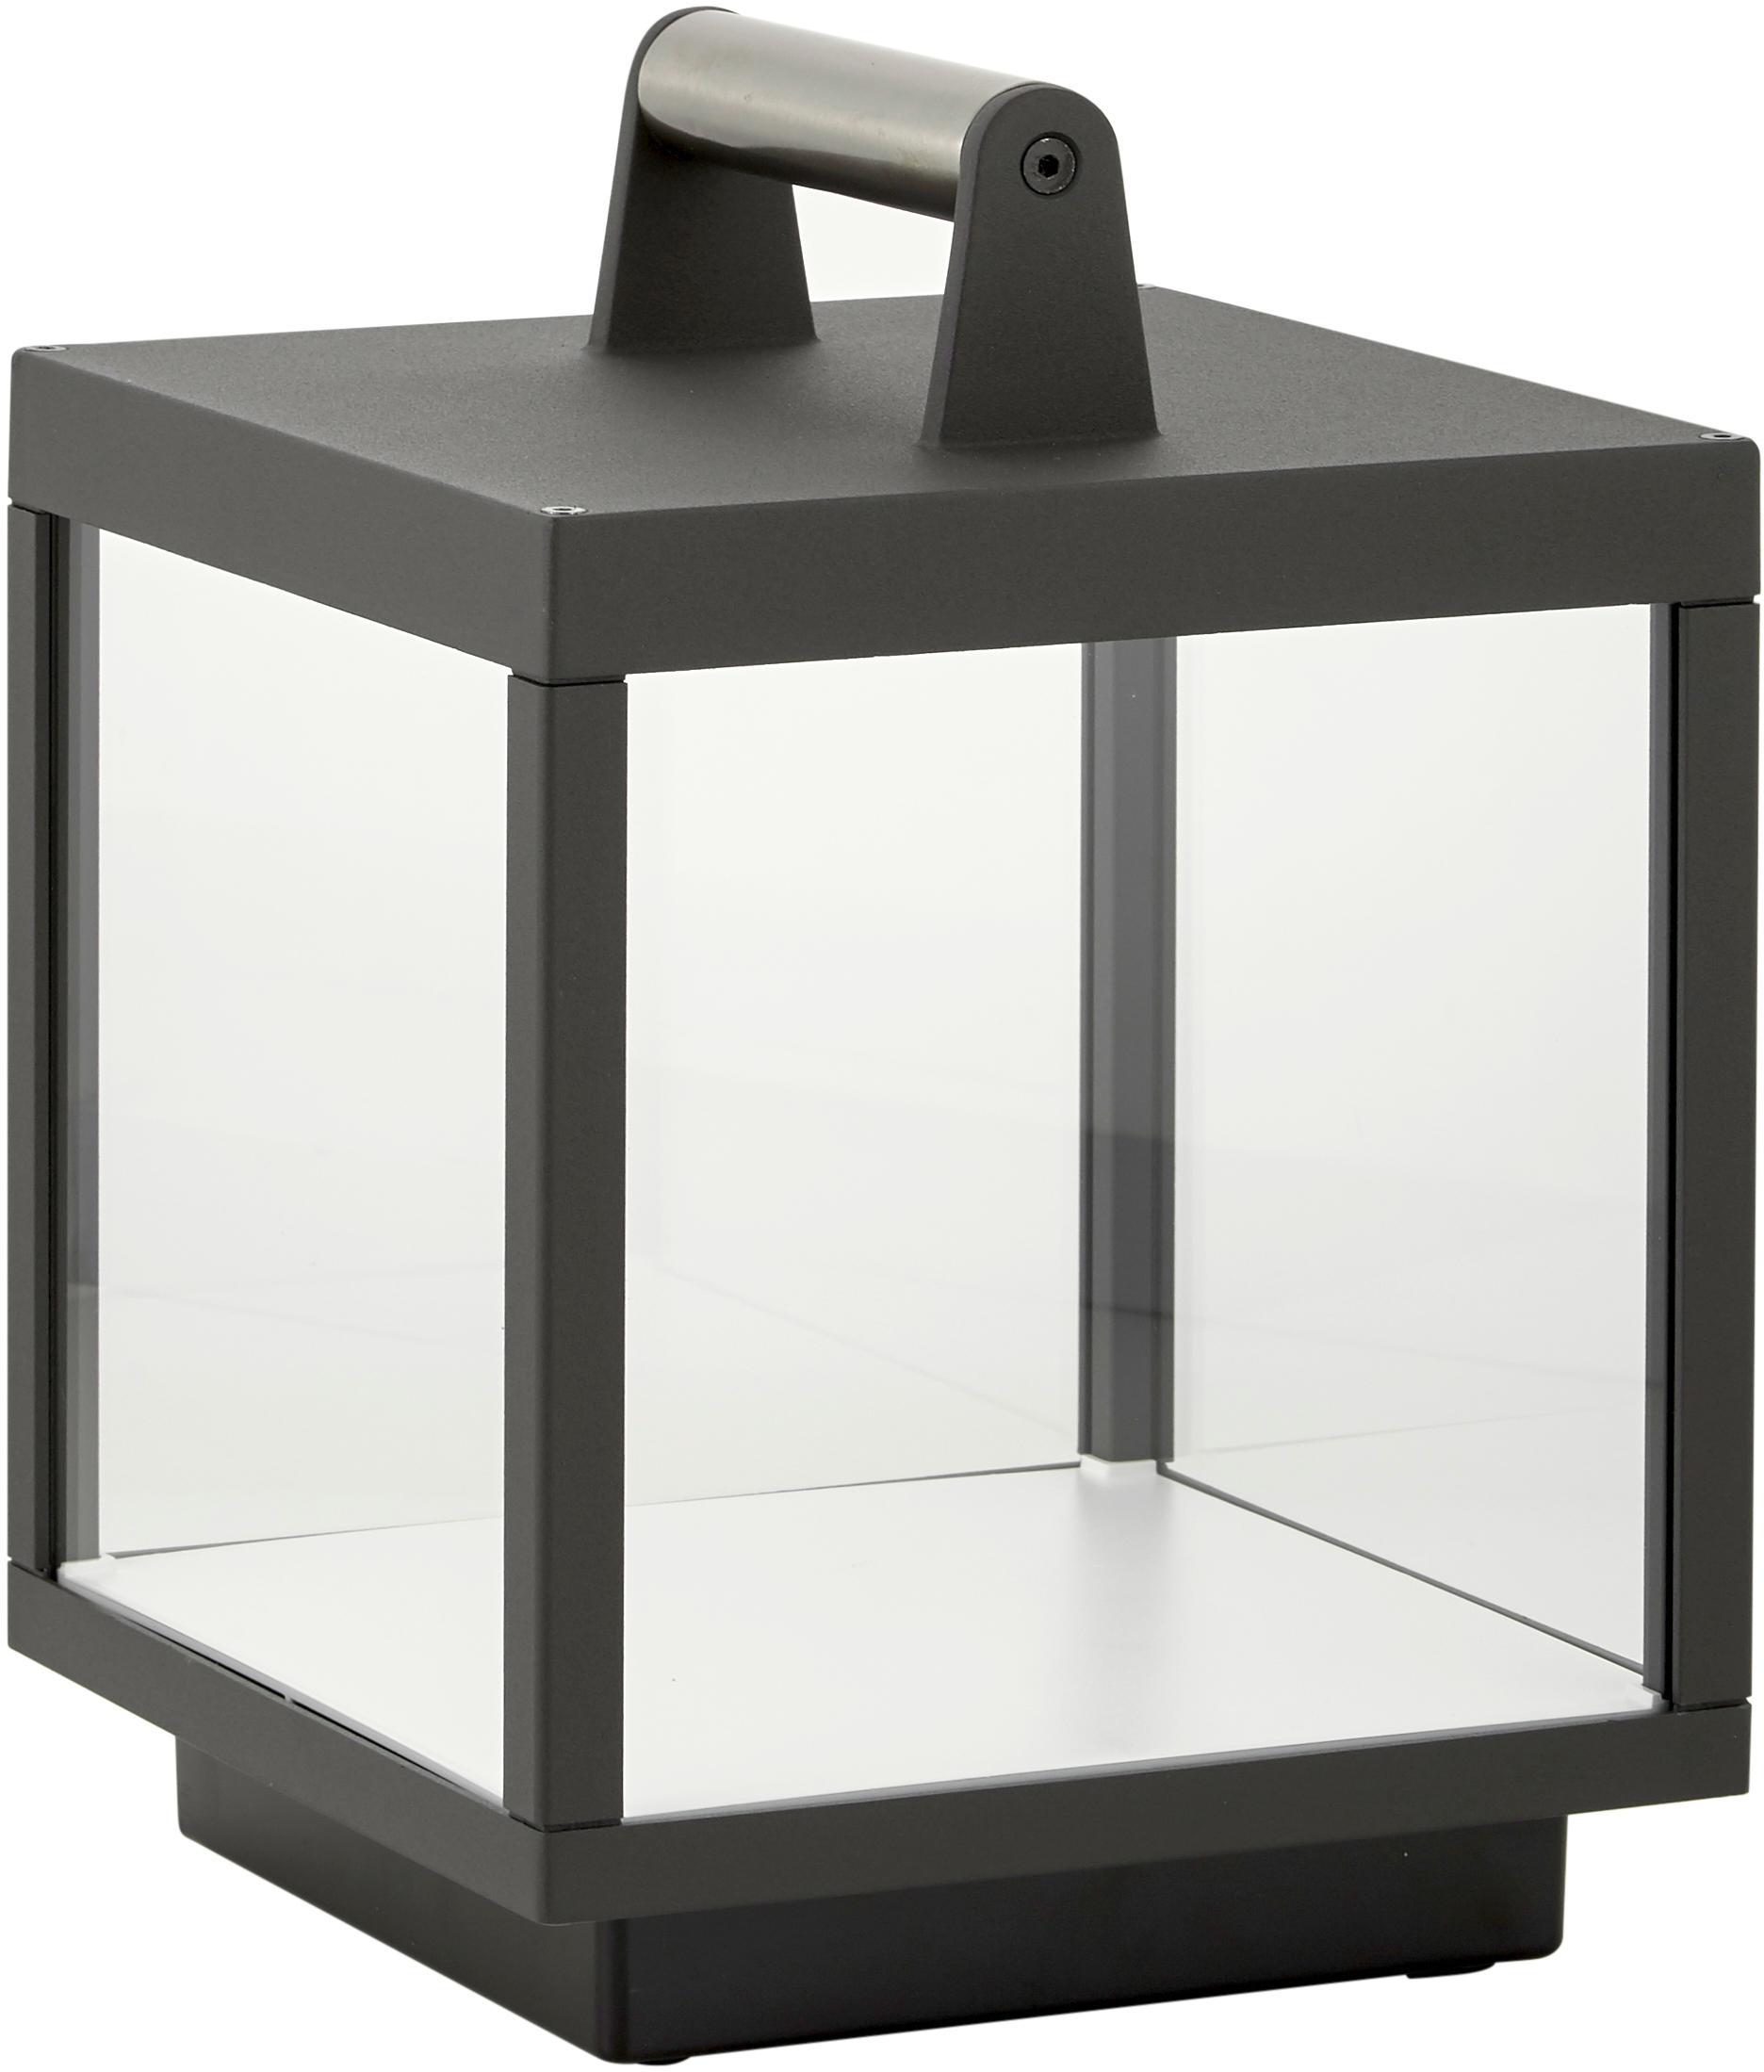 Mobiele LED buitentafellamp Kerala, Frame: gepoedercoat aluminium, Grijs, 18 x 27 cm